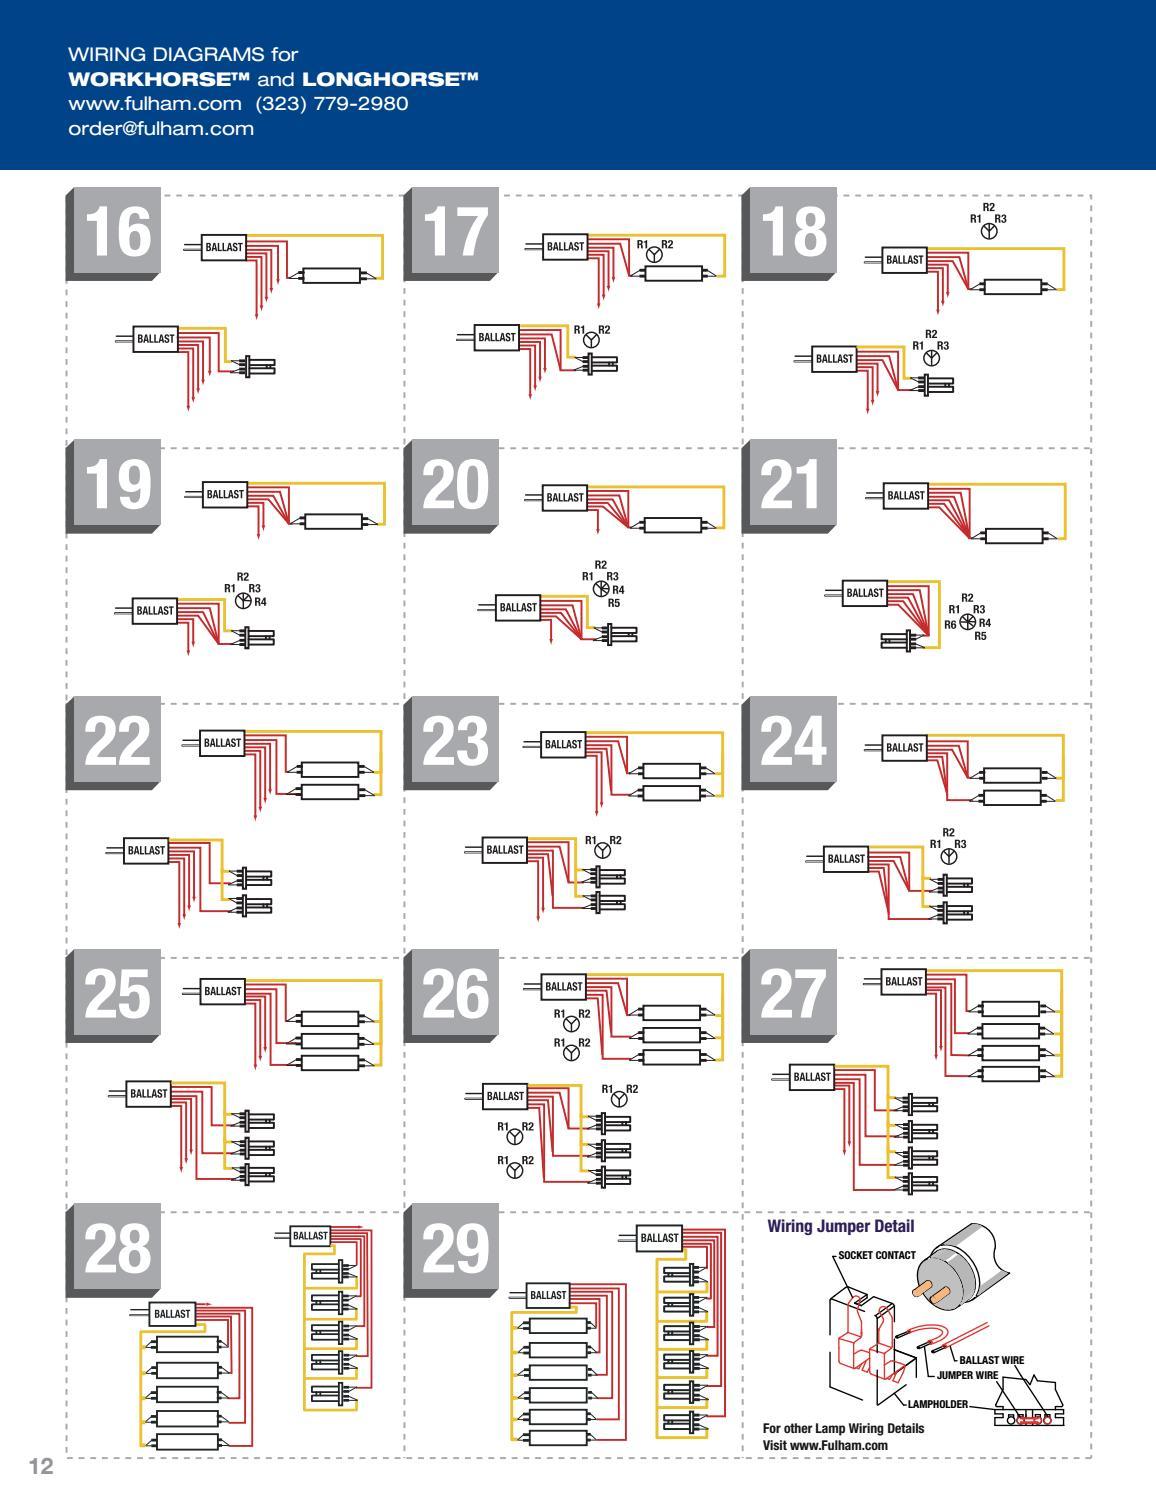 Diagram In Pictures Database Magnetek Ballasts Wiring Diagrams Just Download Or Read Wiring Diagrams Heather Hunt Kripke Models Onyxum Com